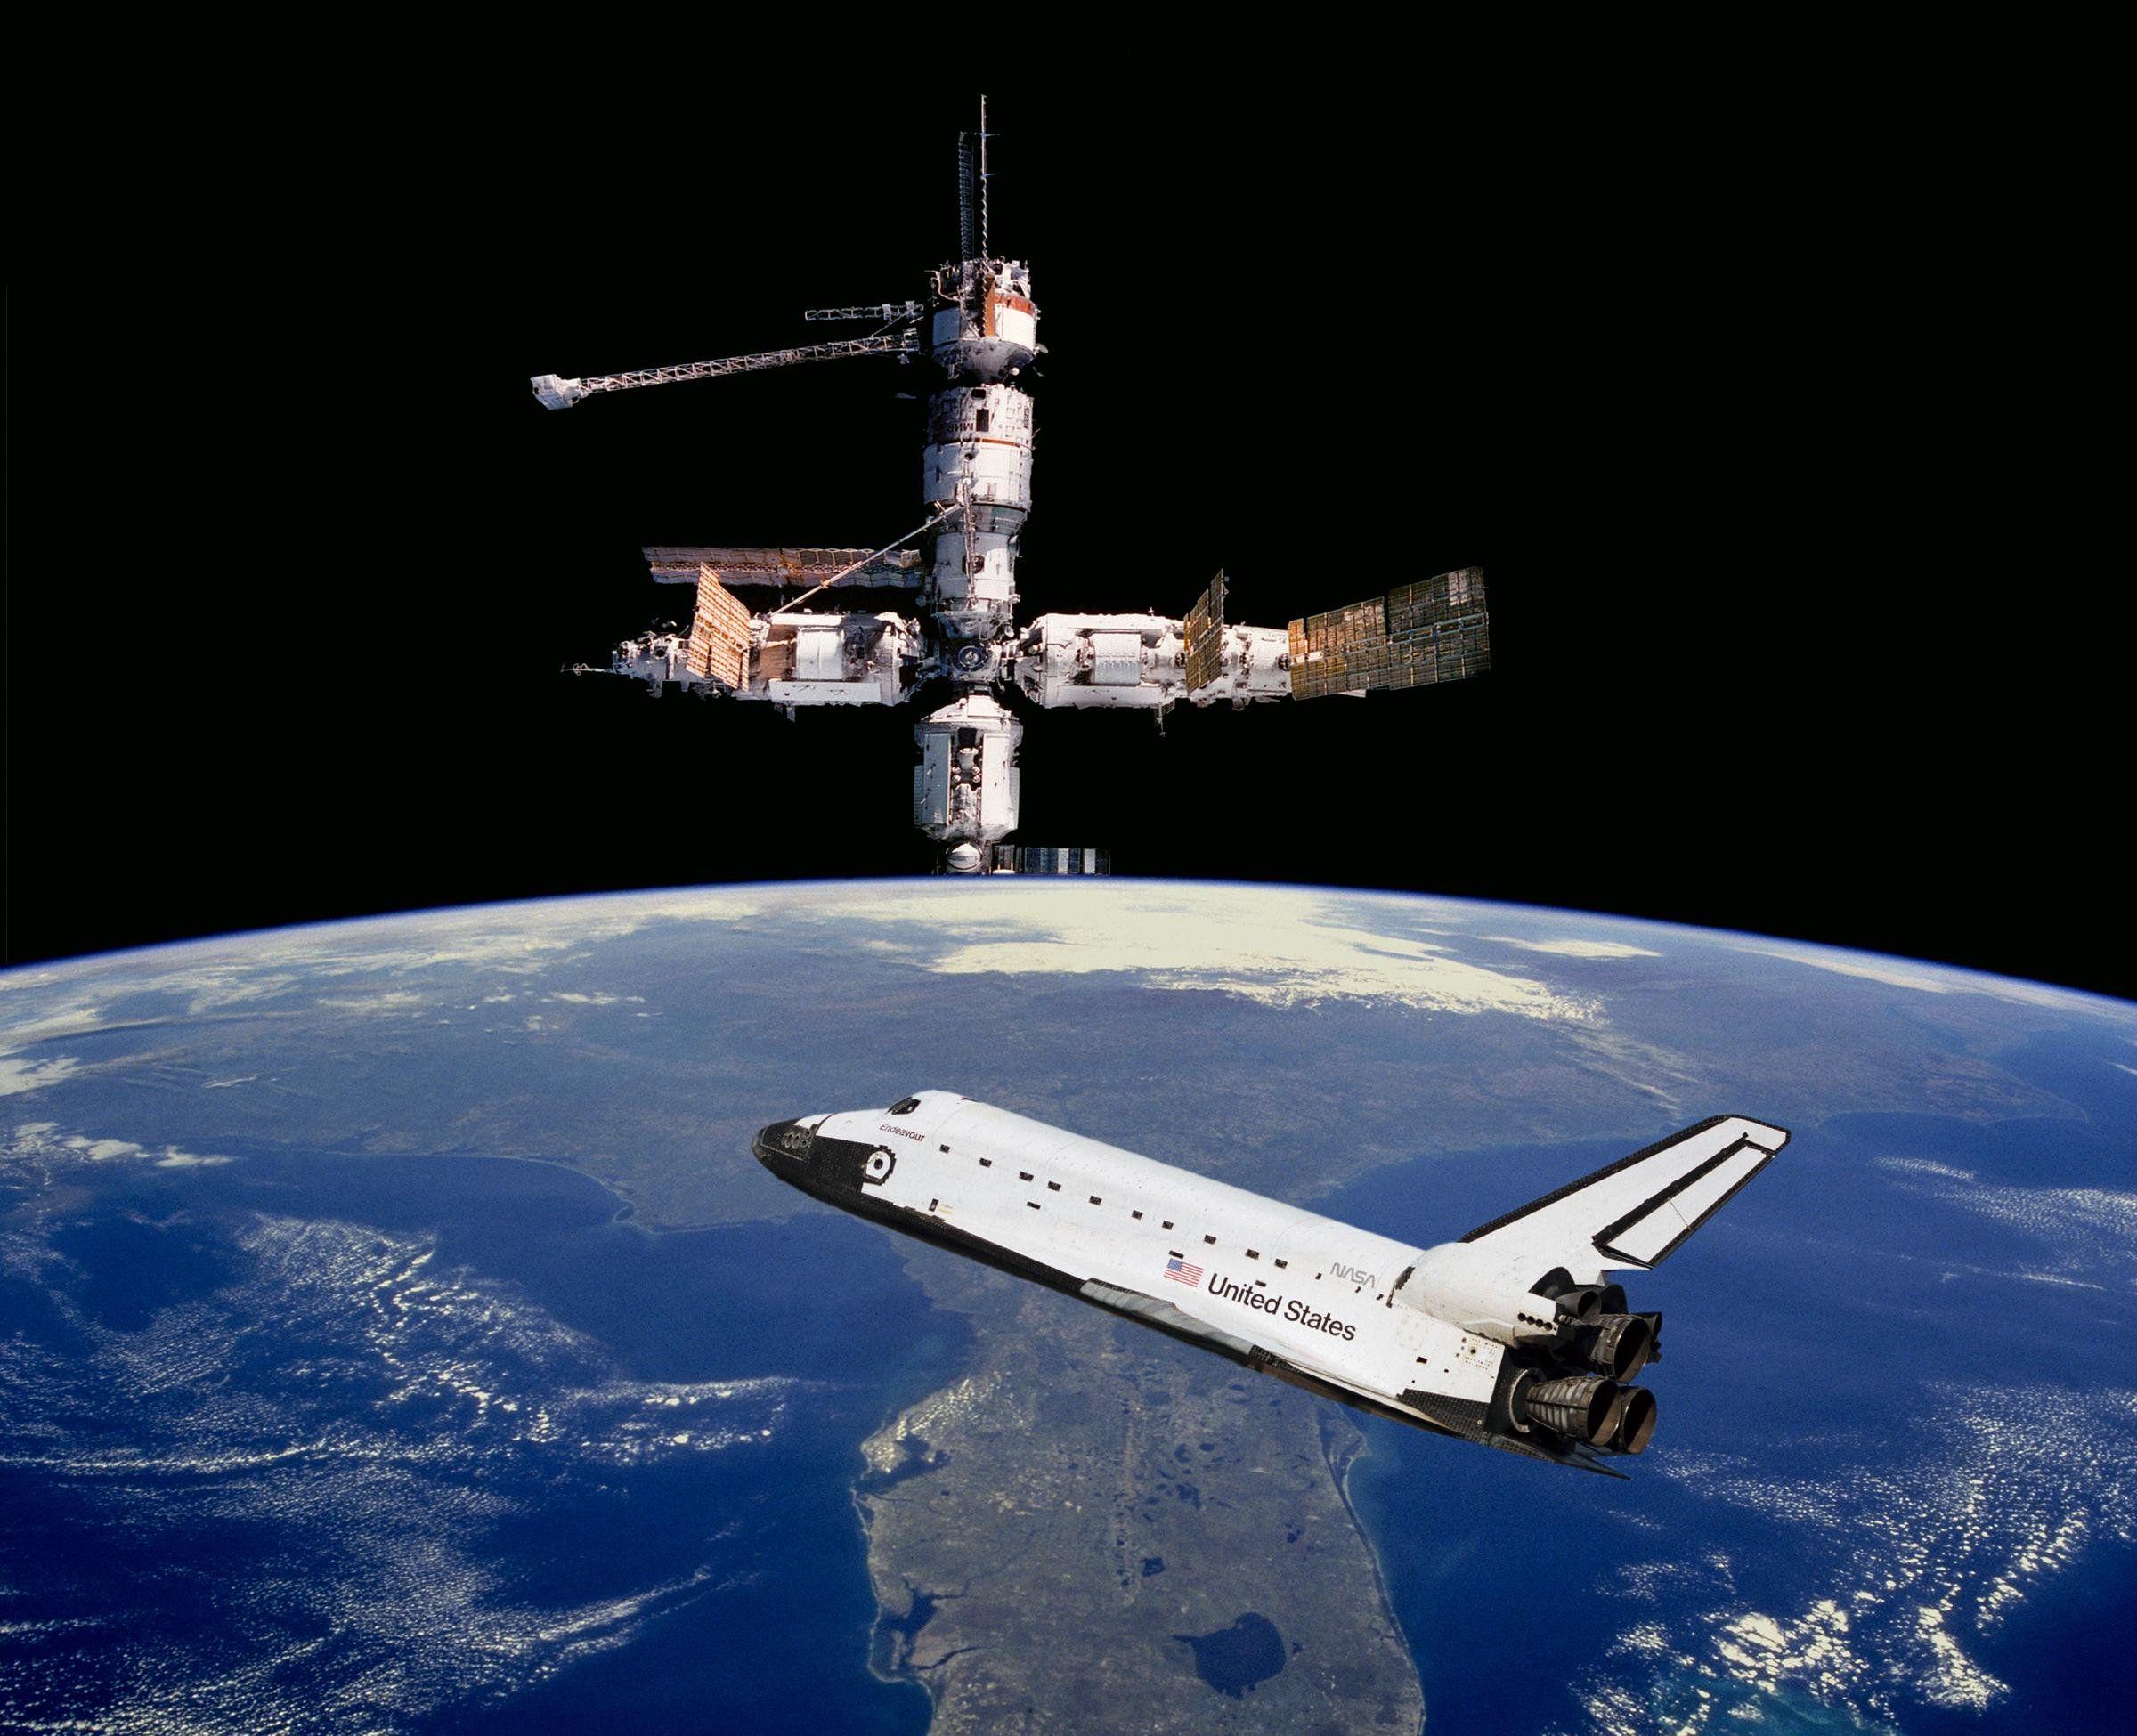 nasa new shuttle spacecraft - photo #13